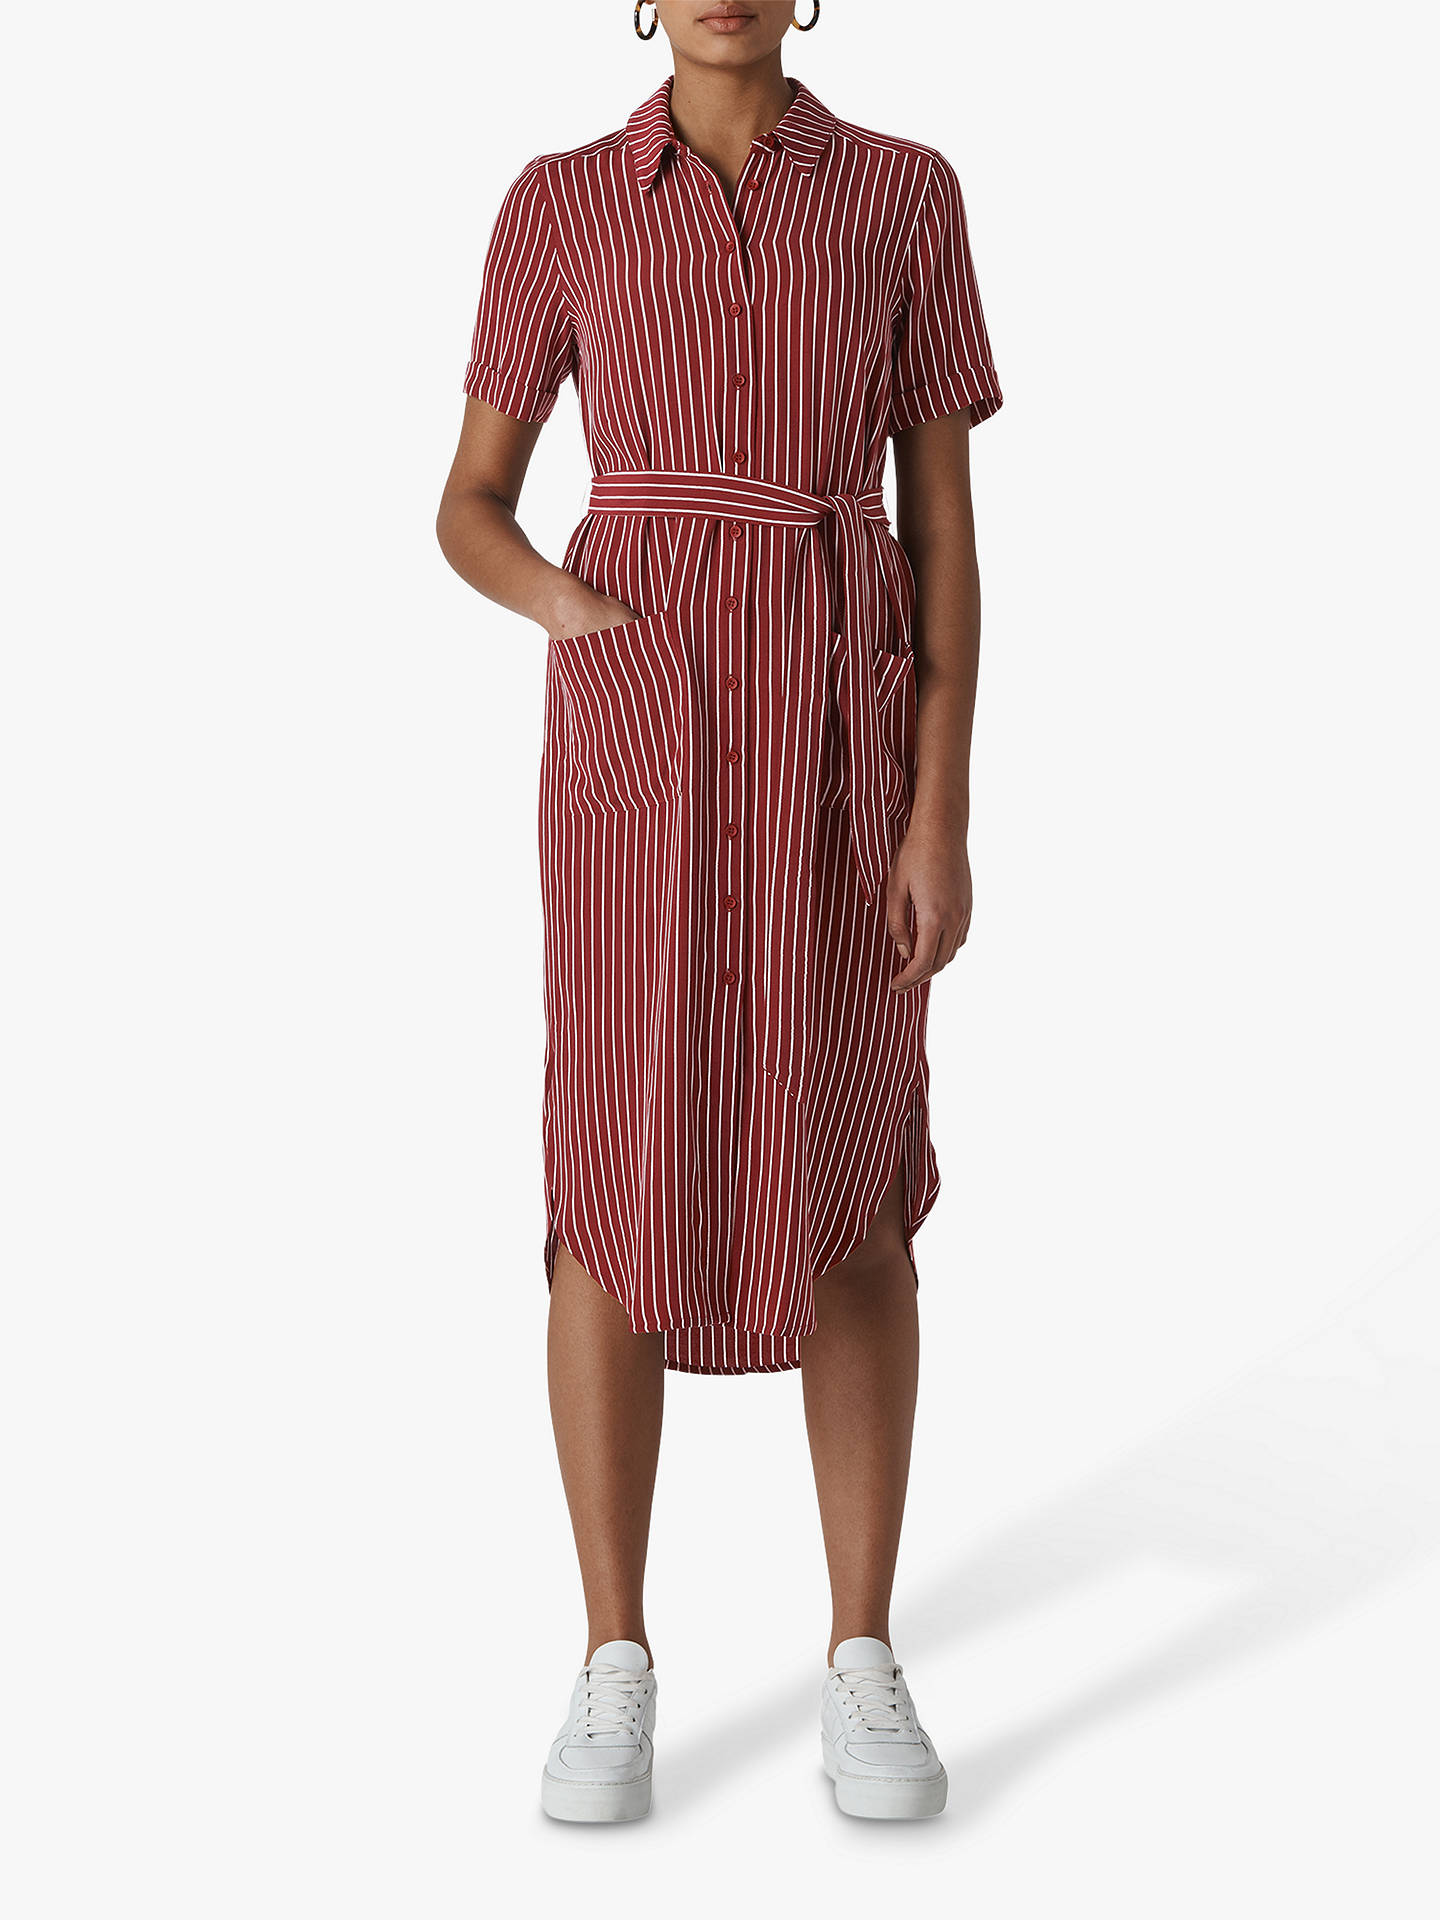 7b11cc45ec6 Buy Whistles Montana Shirt Dress